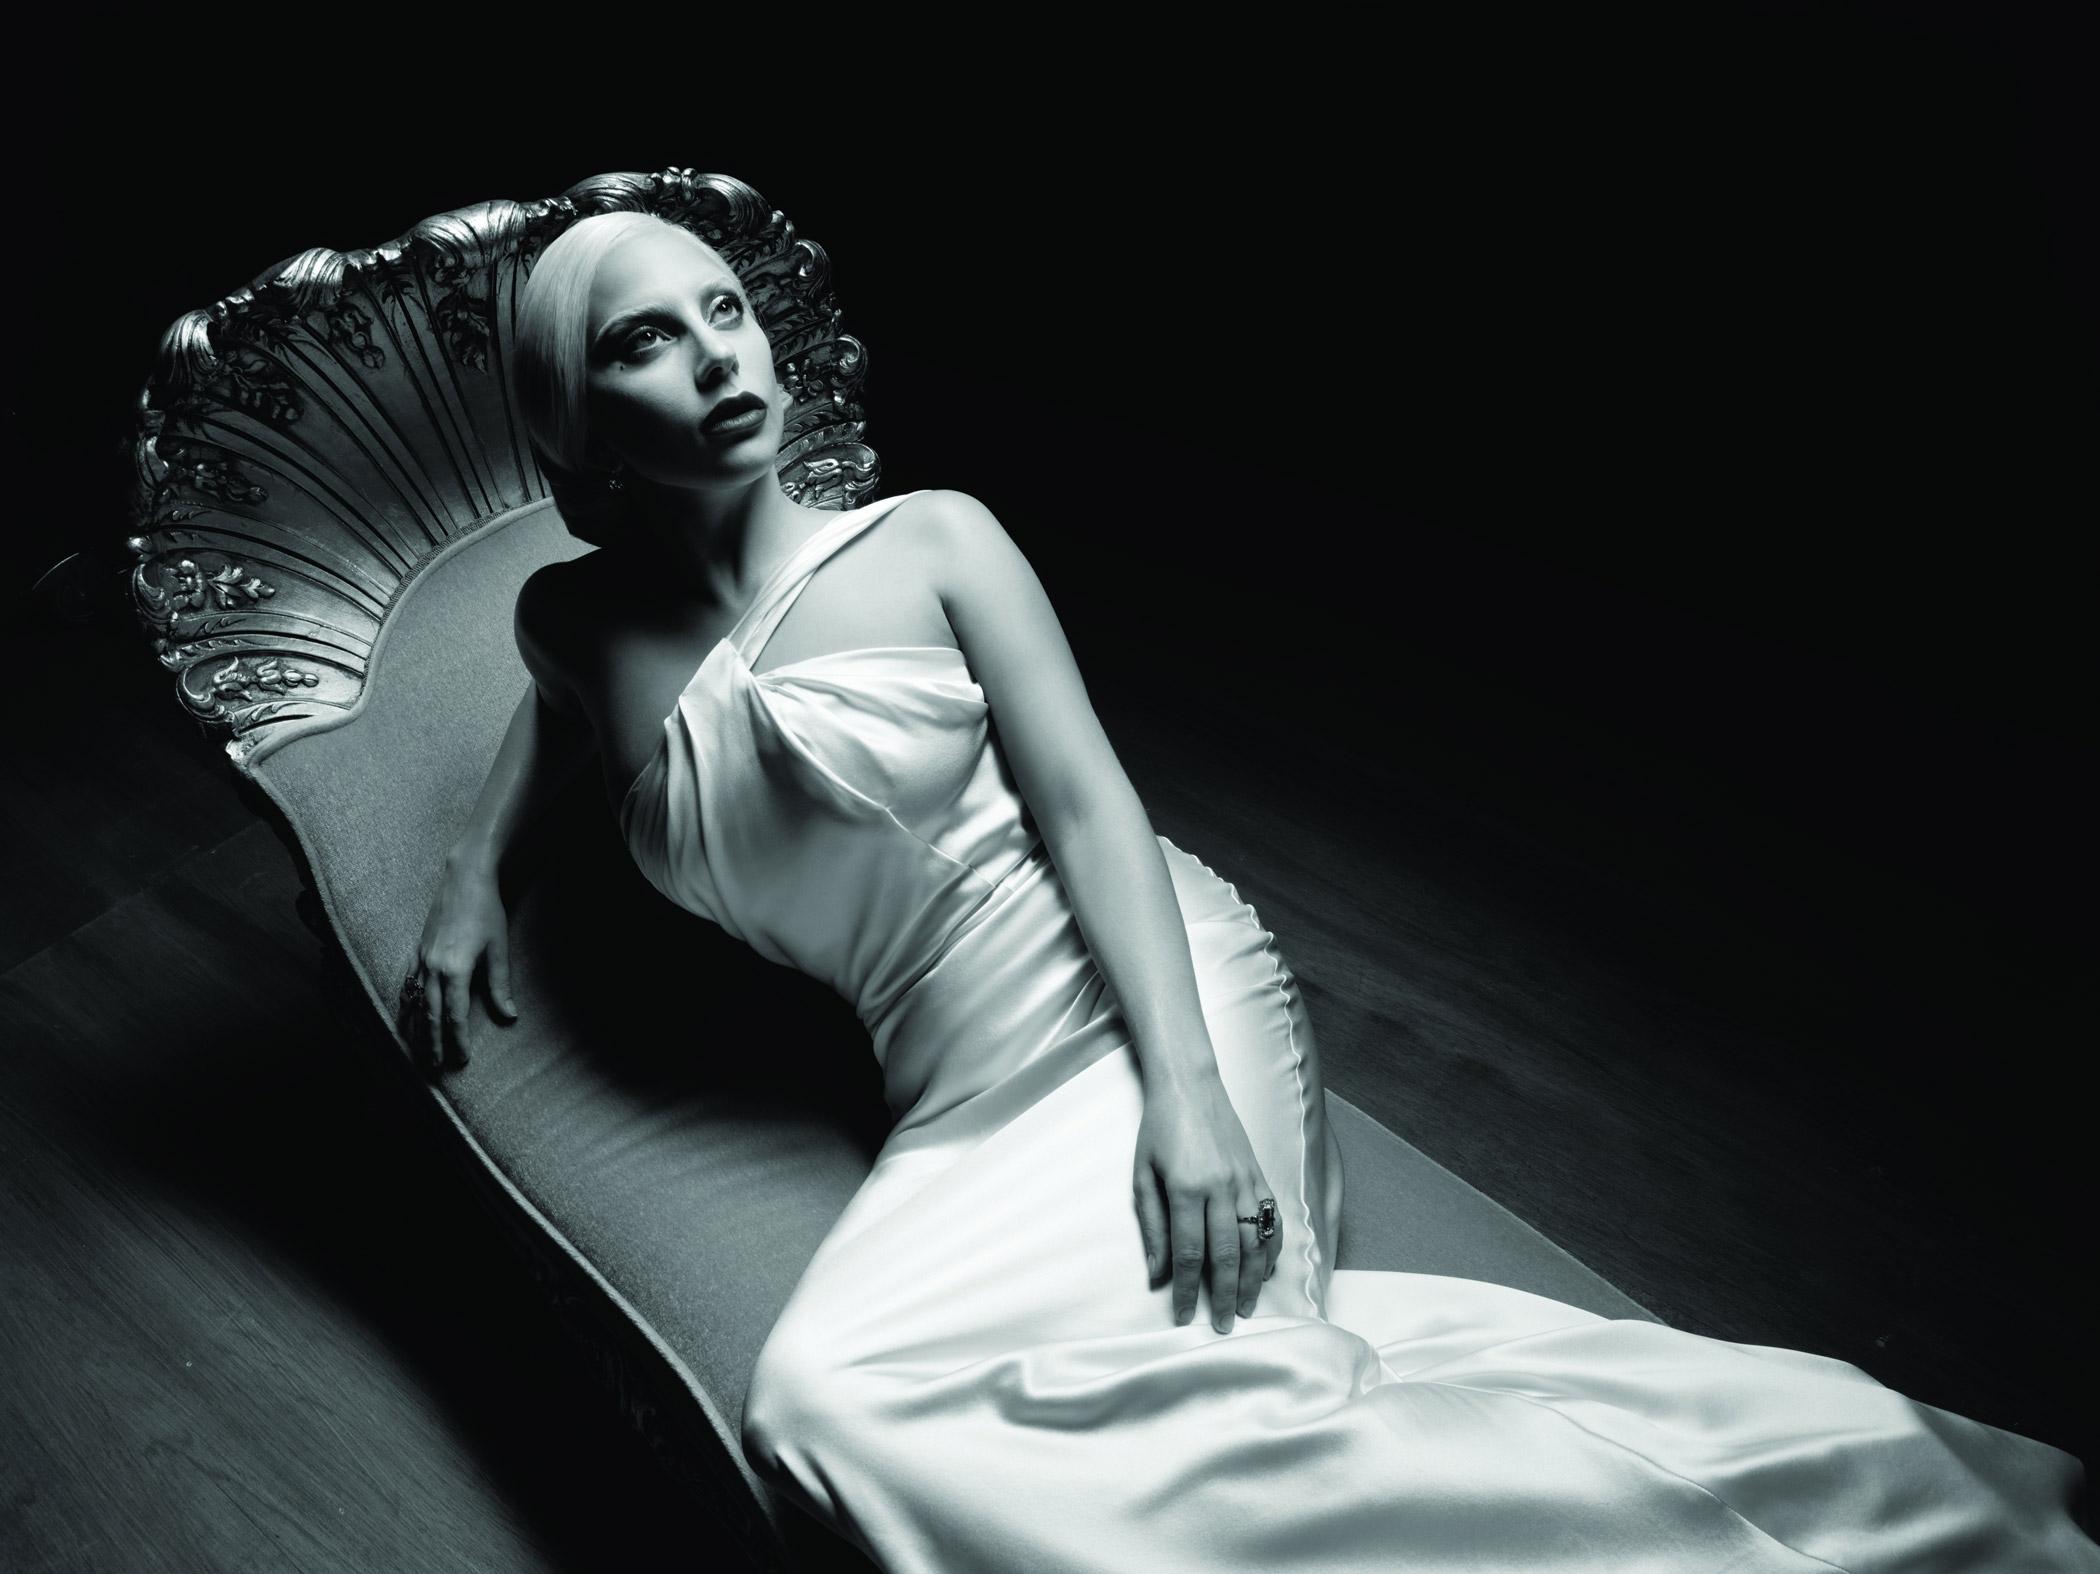 Lady Gaga as The Countess.